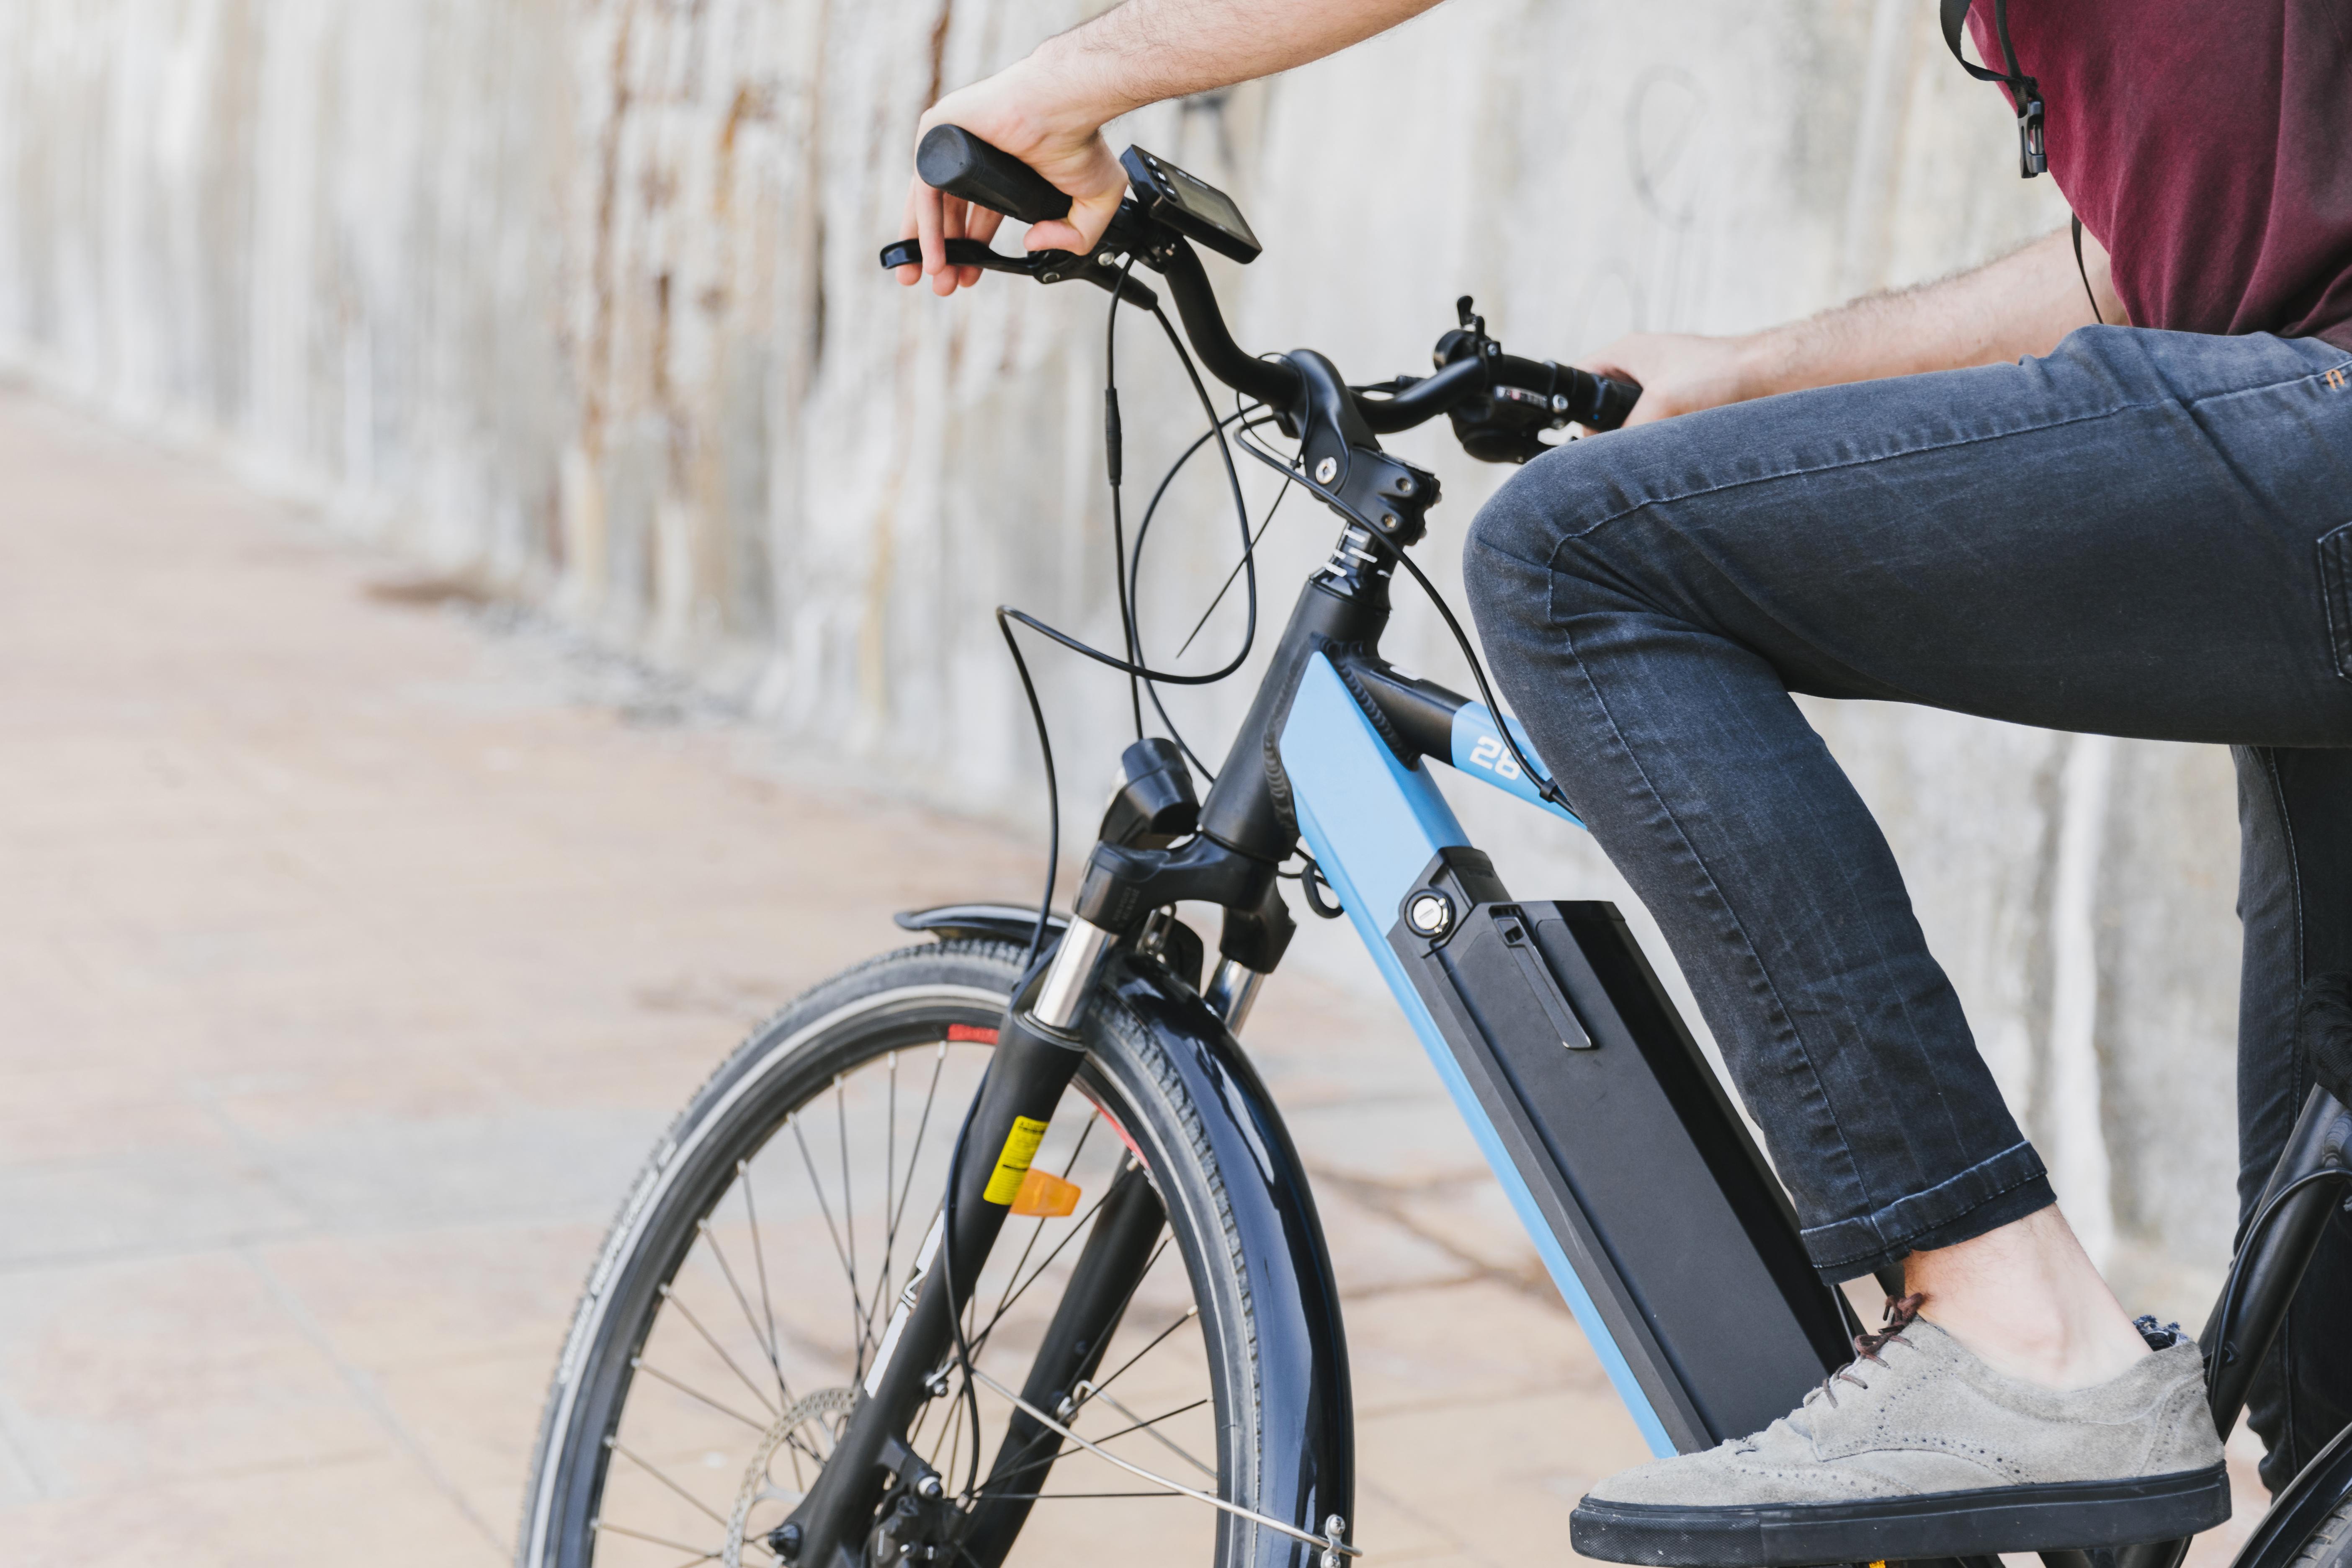 E Bike Akku Lebensdauer verbessern: Dies ist zu beachten